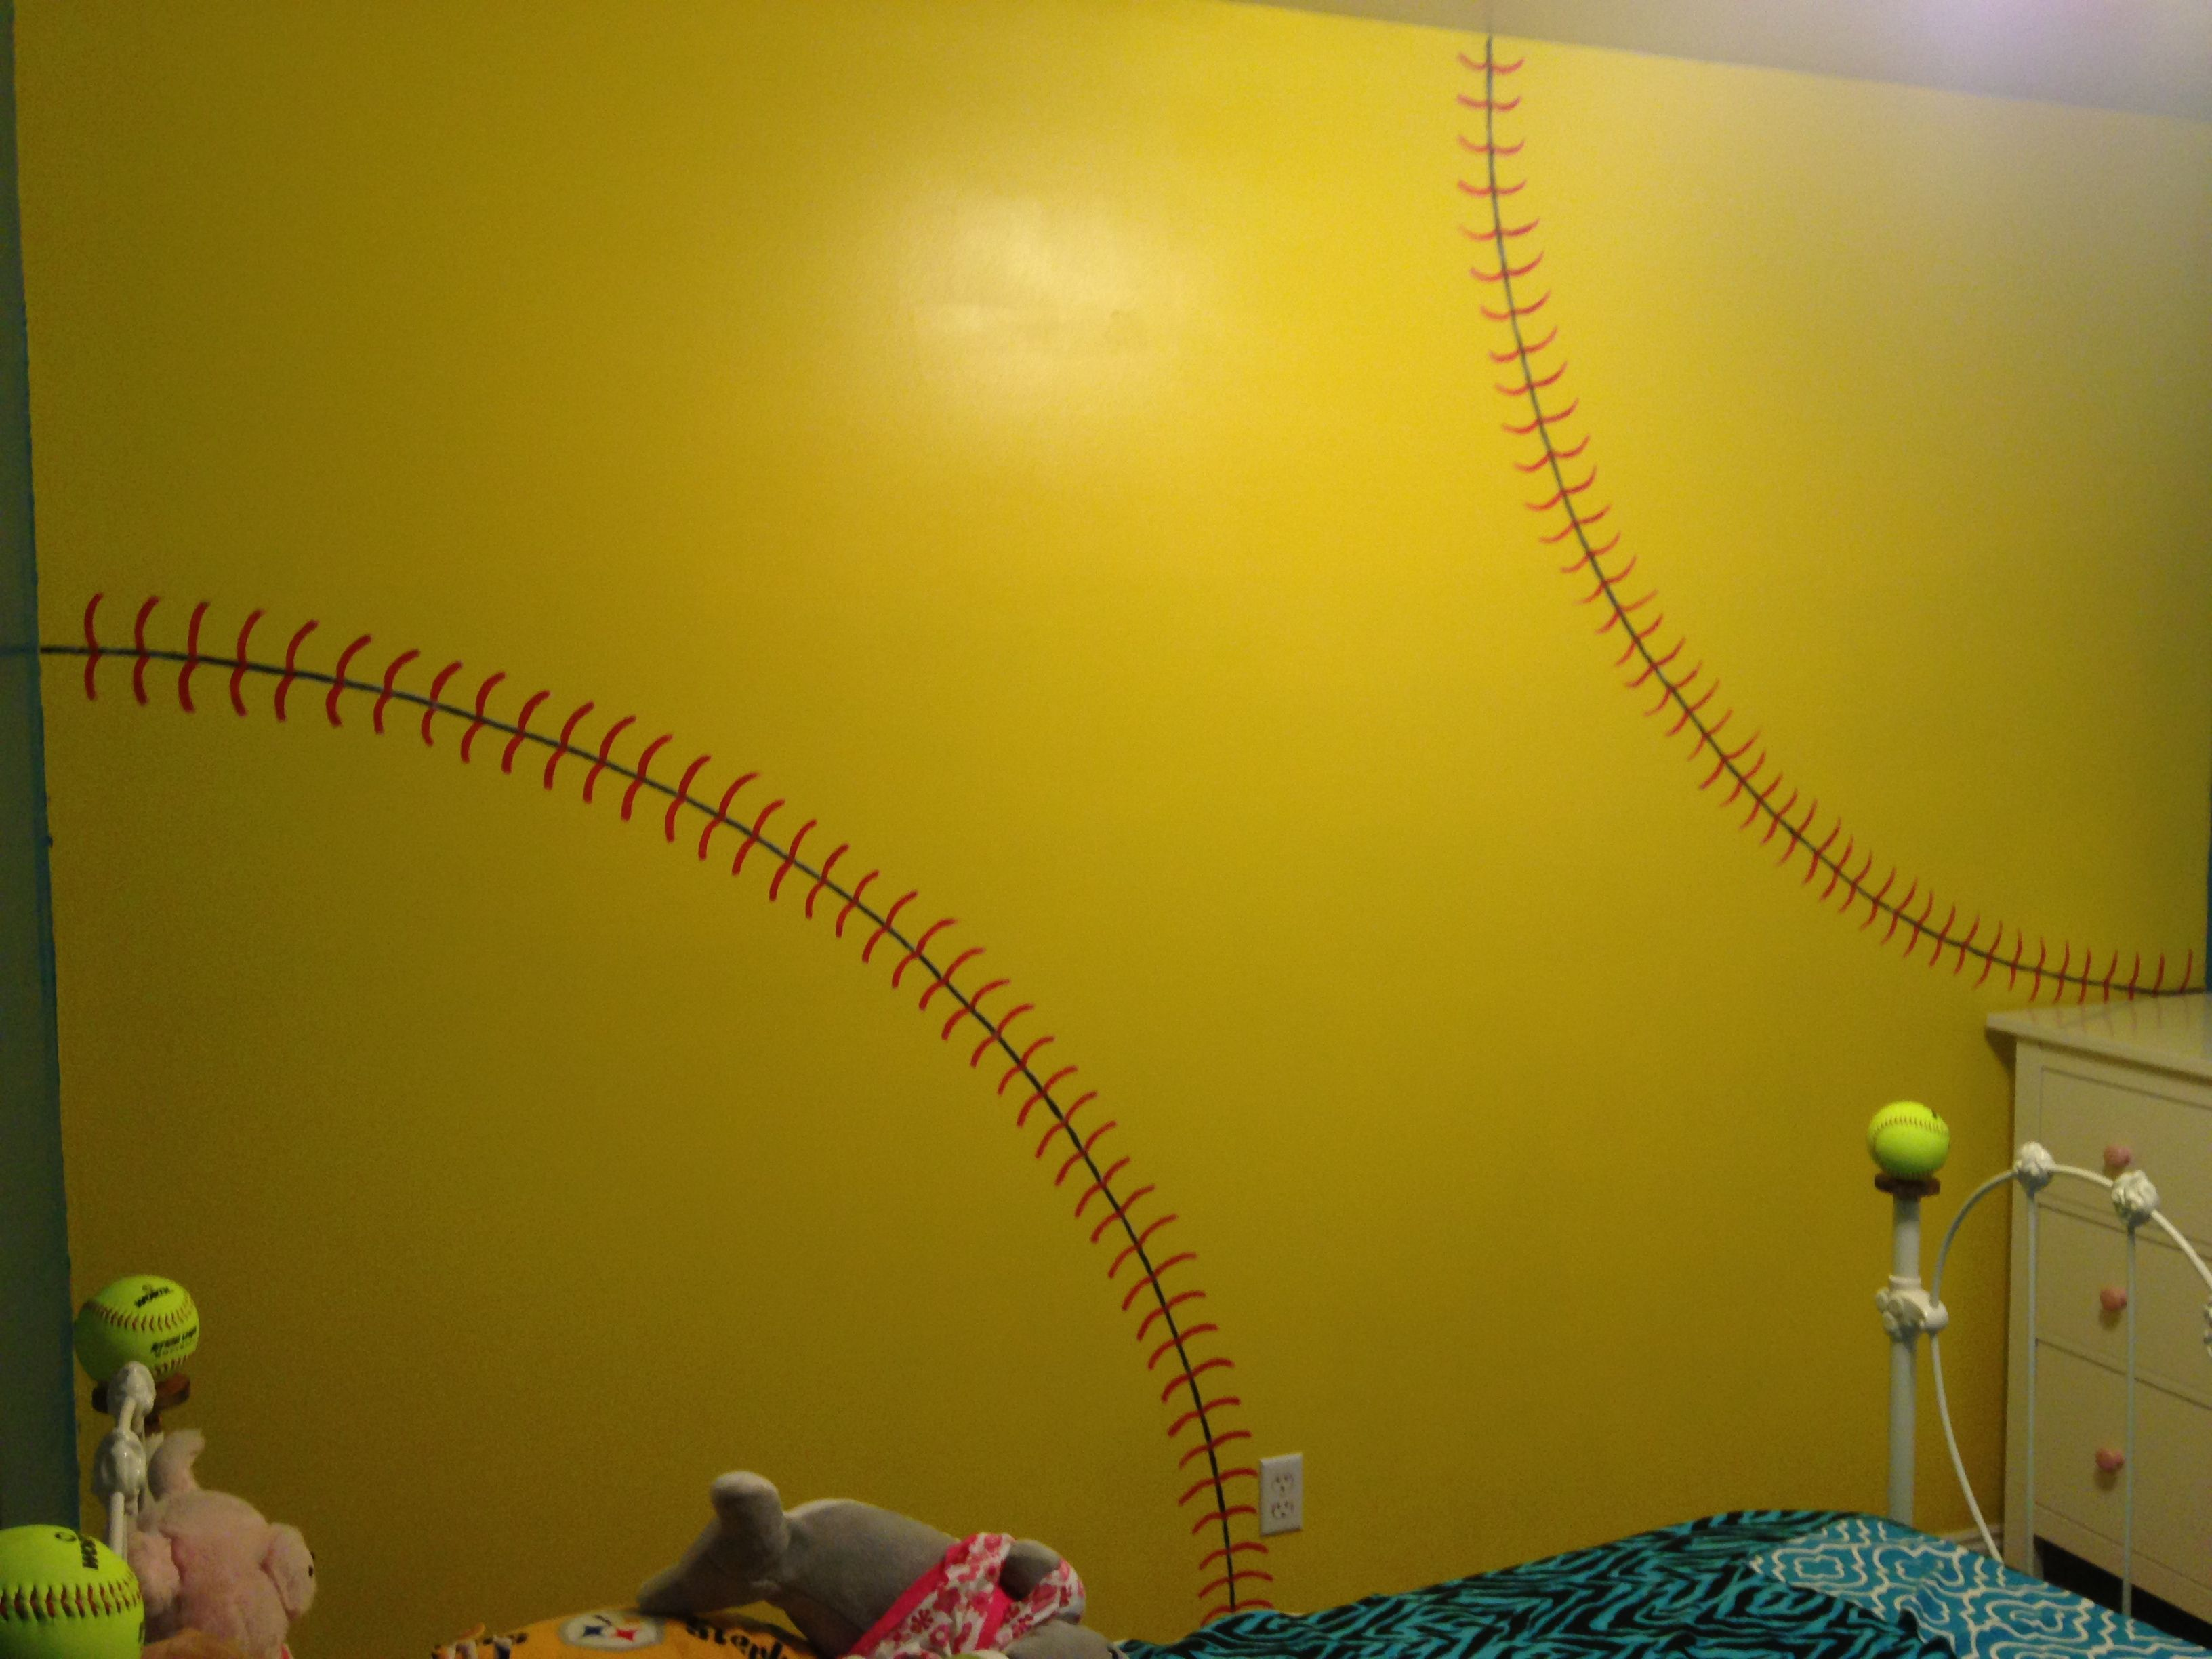 Pin By Amy Holtz On Softball Softball Room Softball Bedroom Softball Softball decorations for bedroom